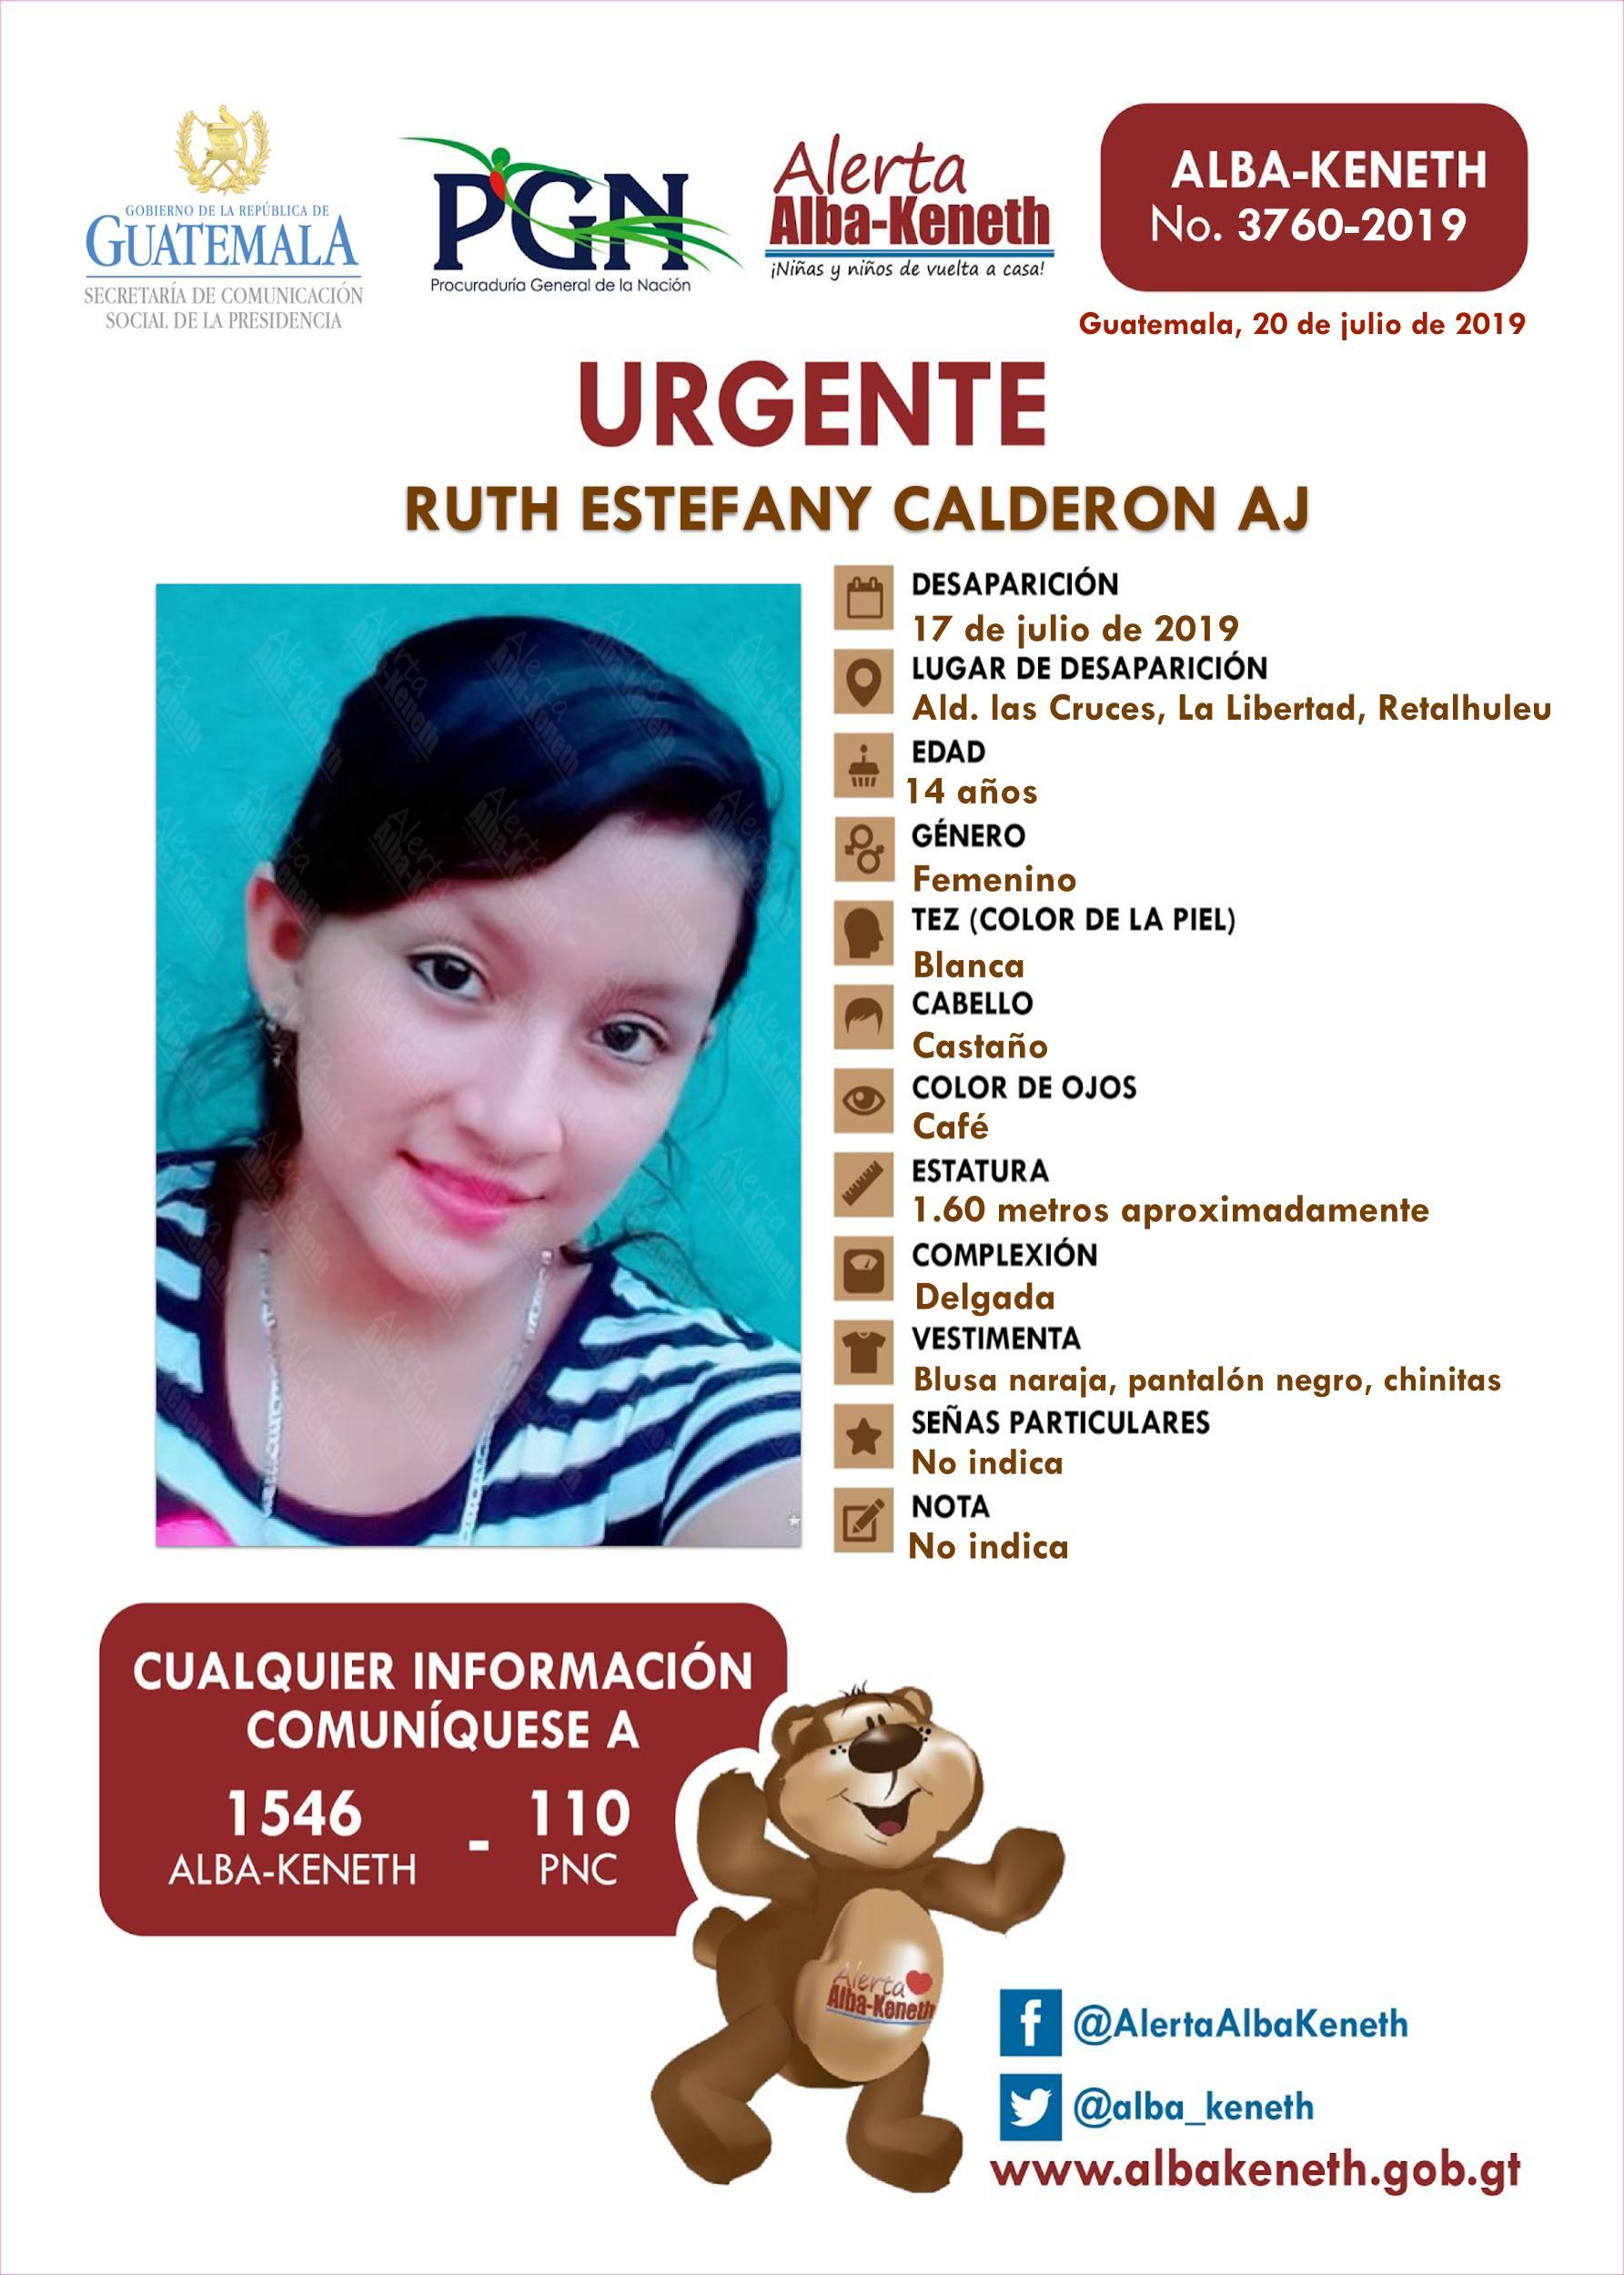 Ruth Estefany Calderon Aj